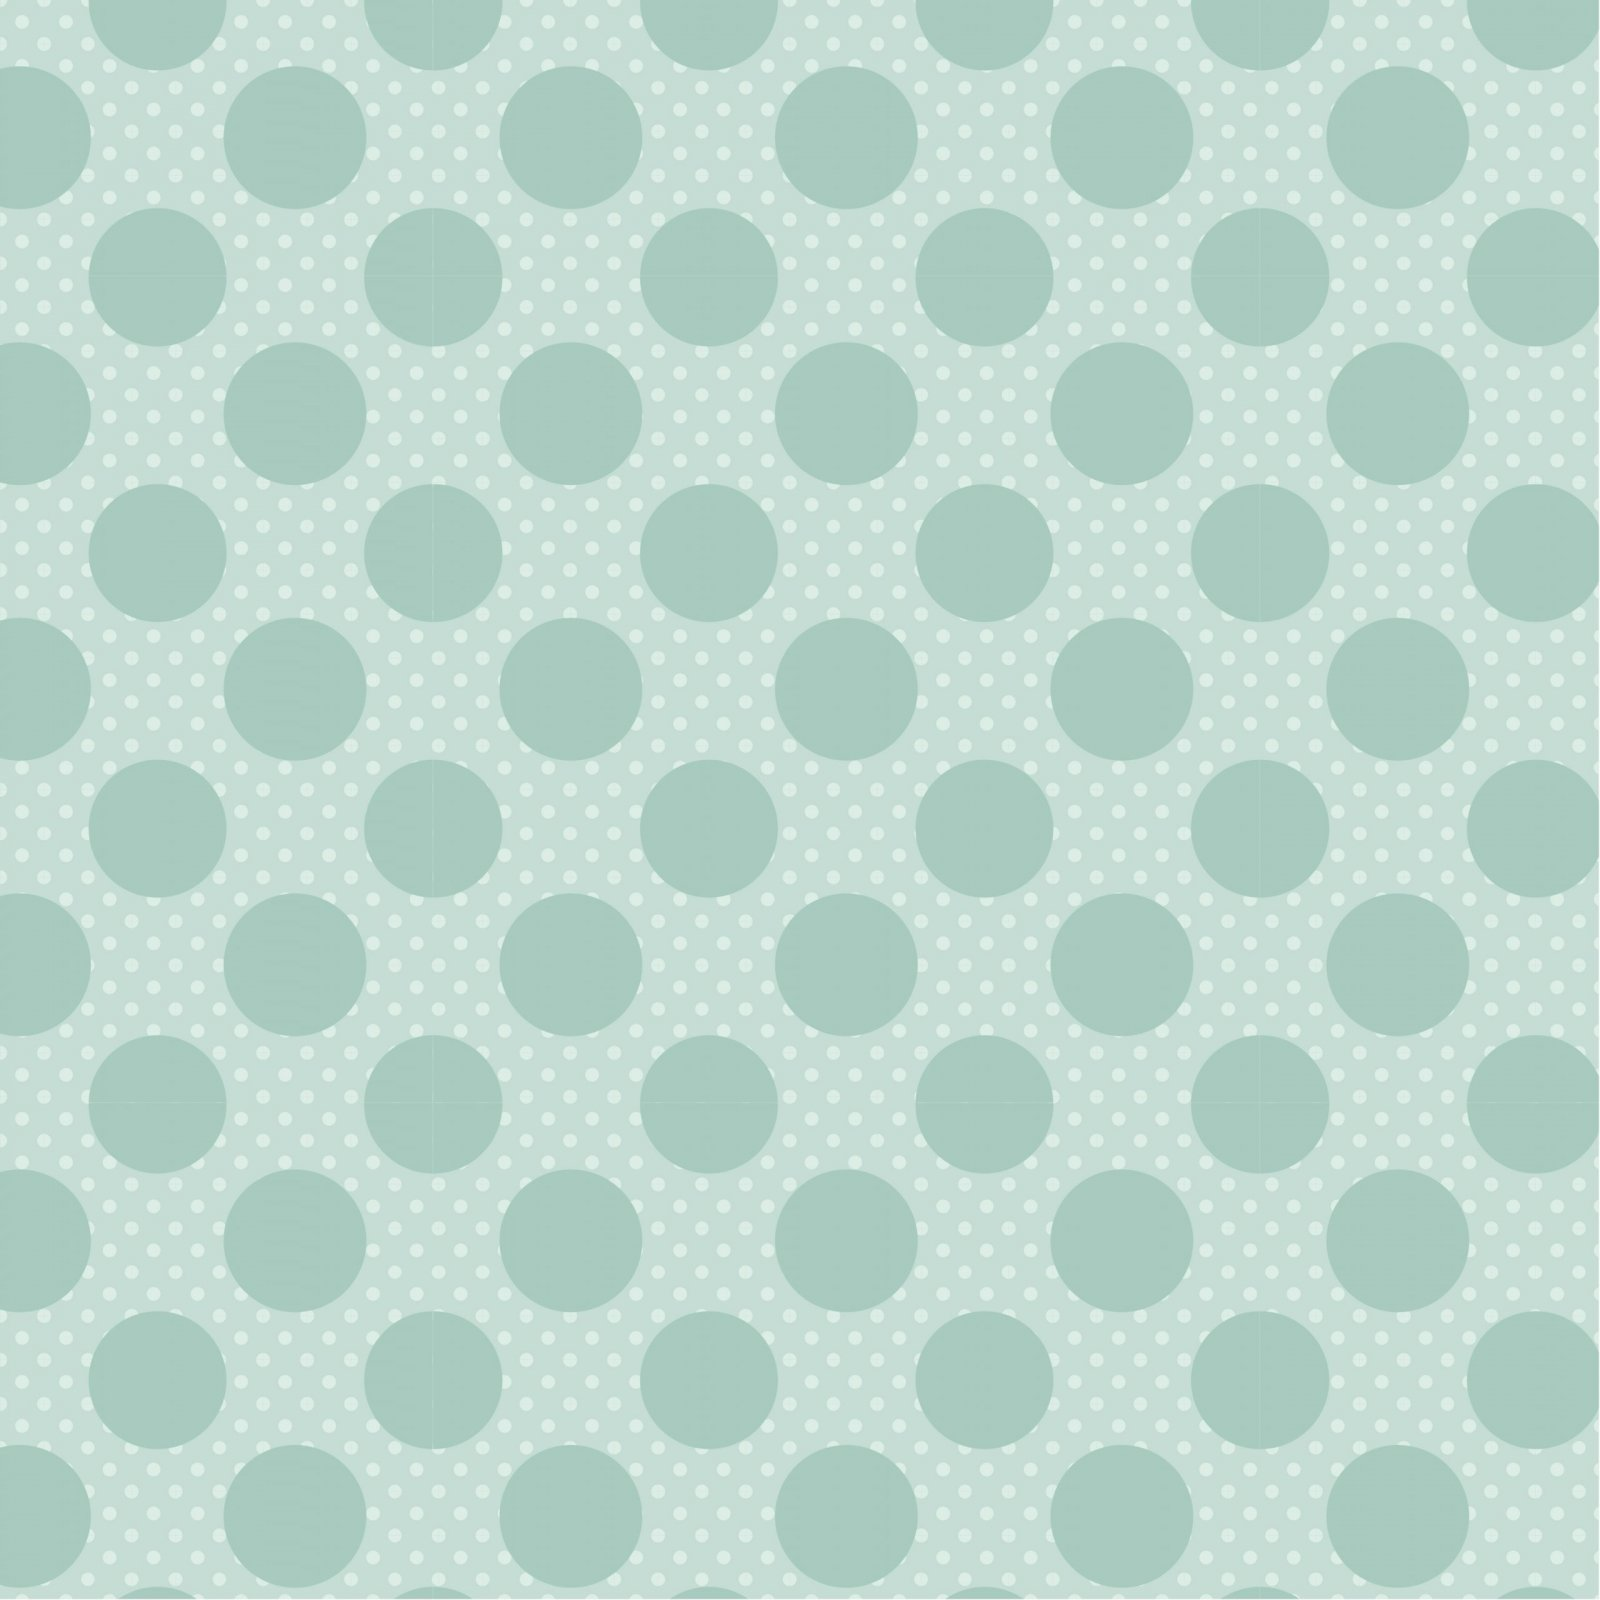 Dots & Poppies - Dots on Dots Green